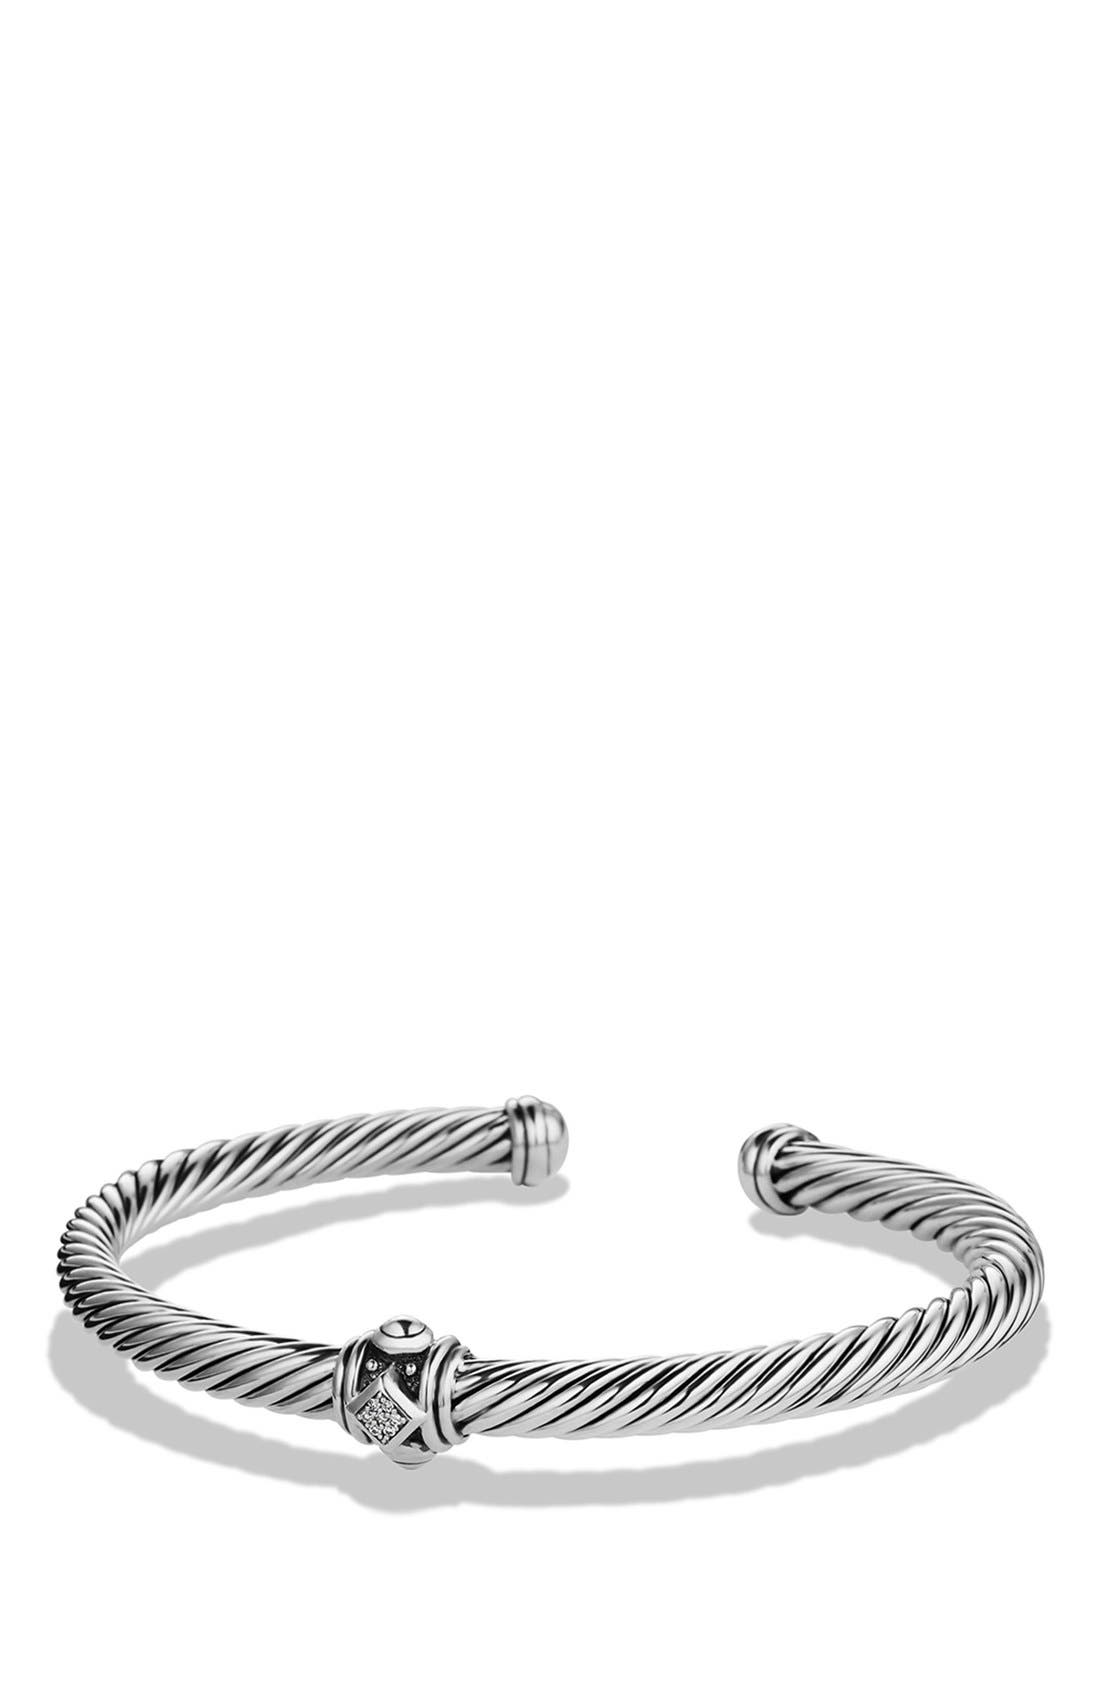 David Yurman 'Renaissance' Bracelet with Diamonds